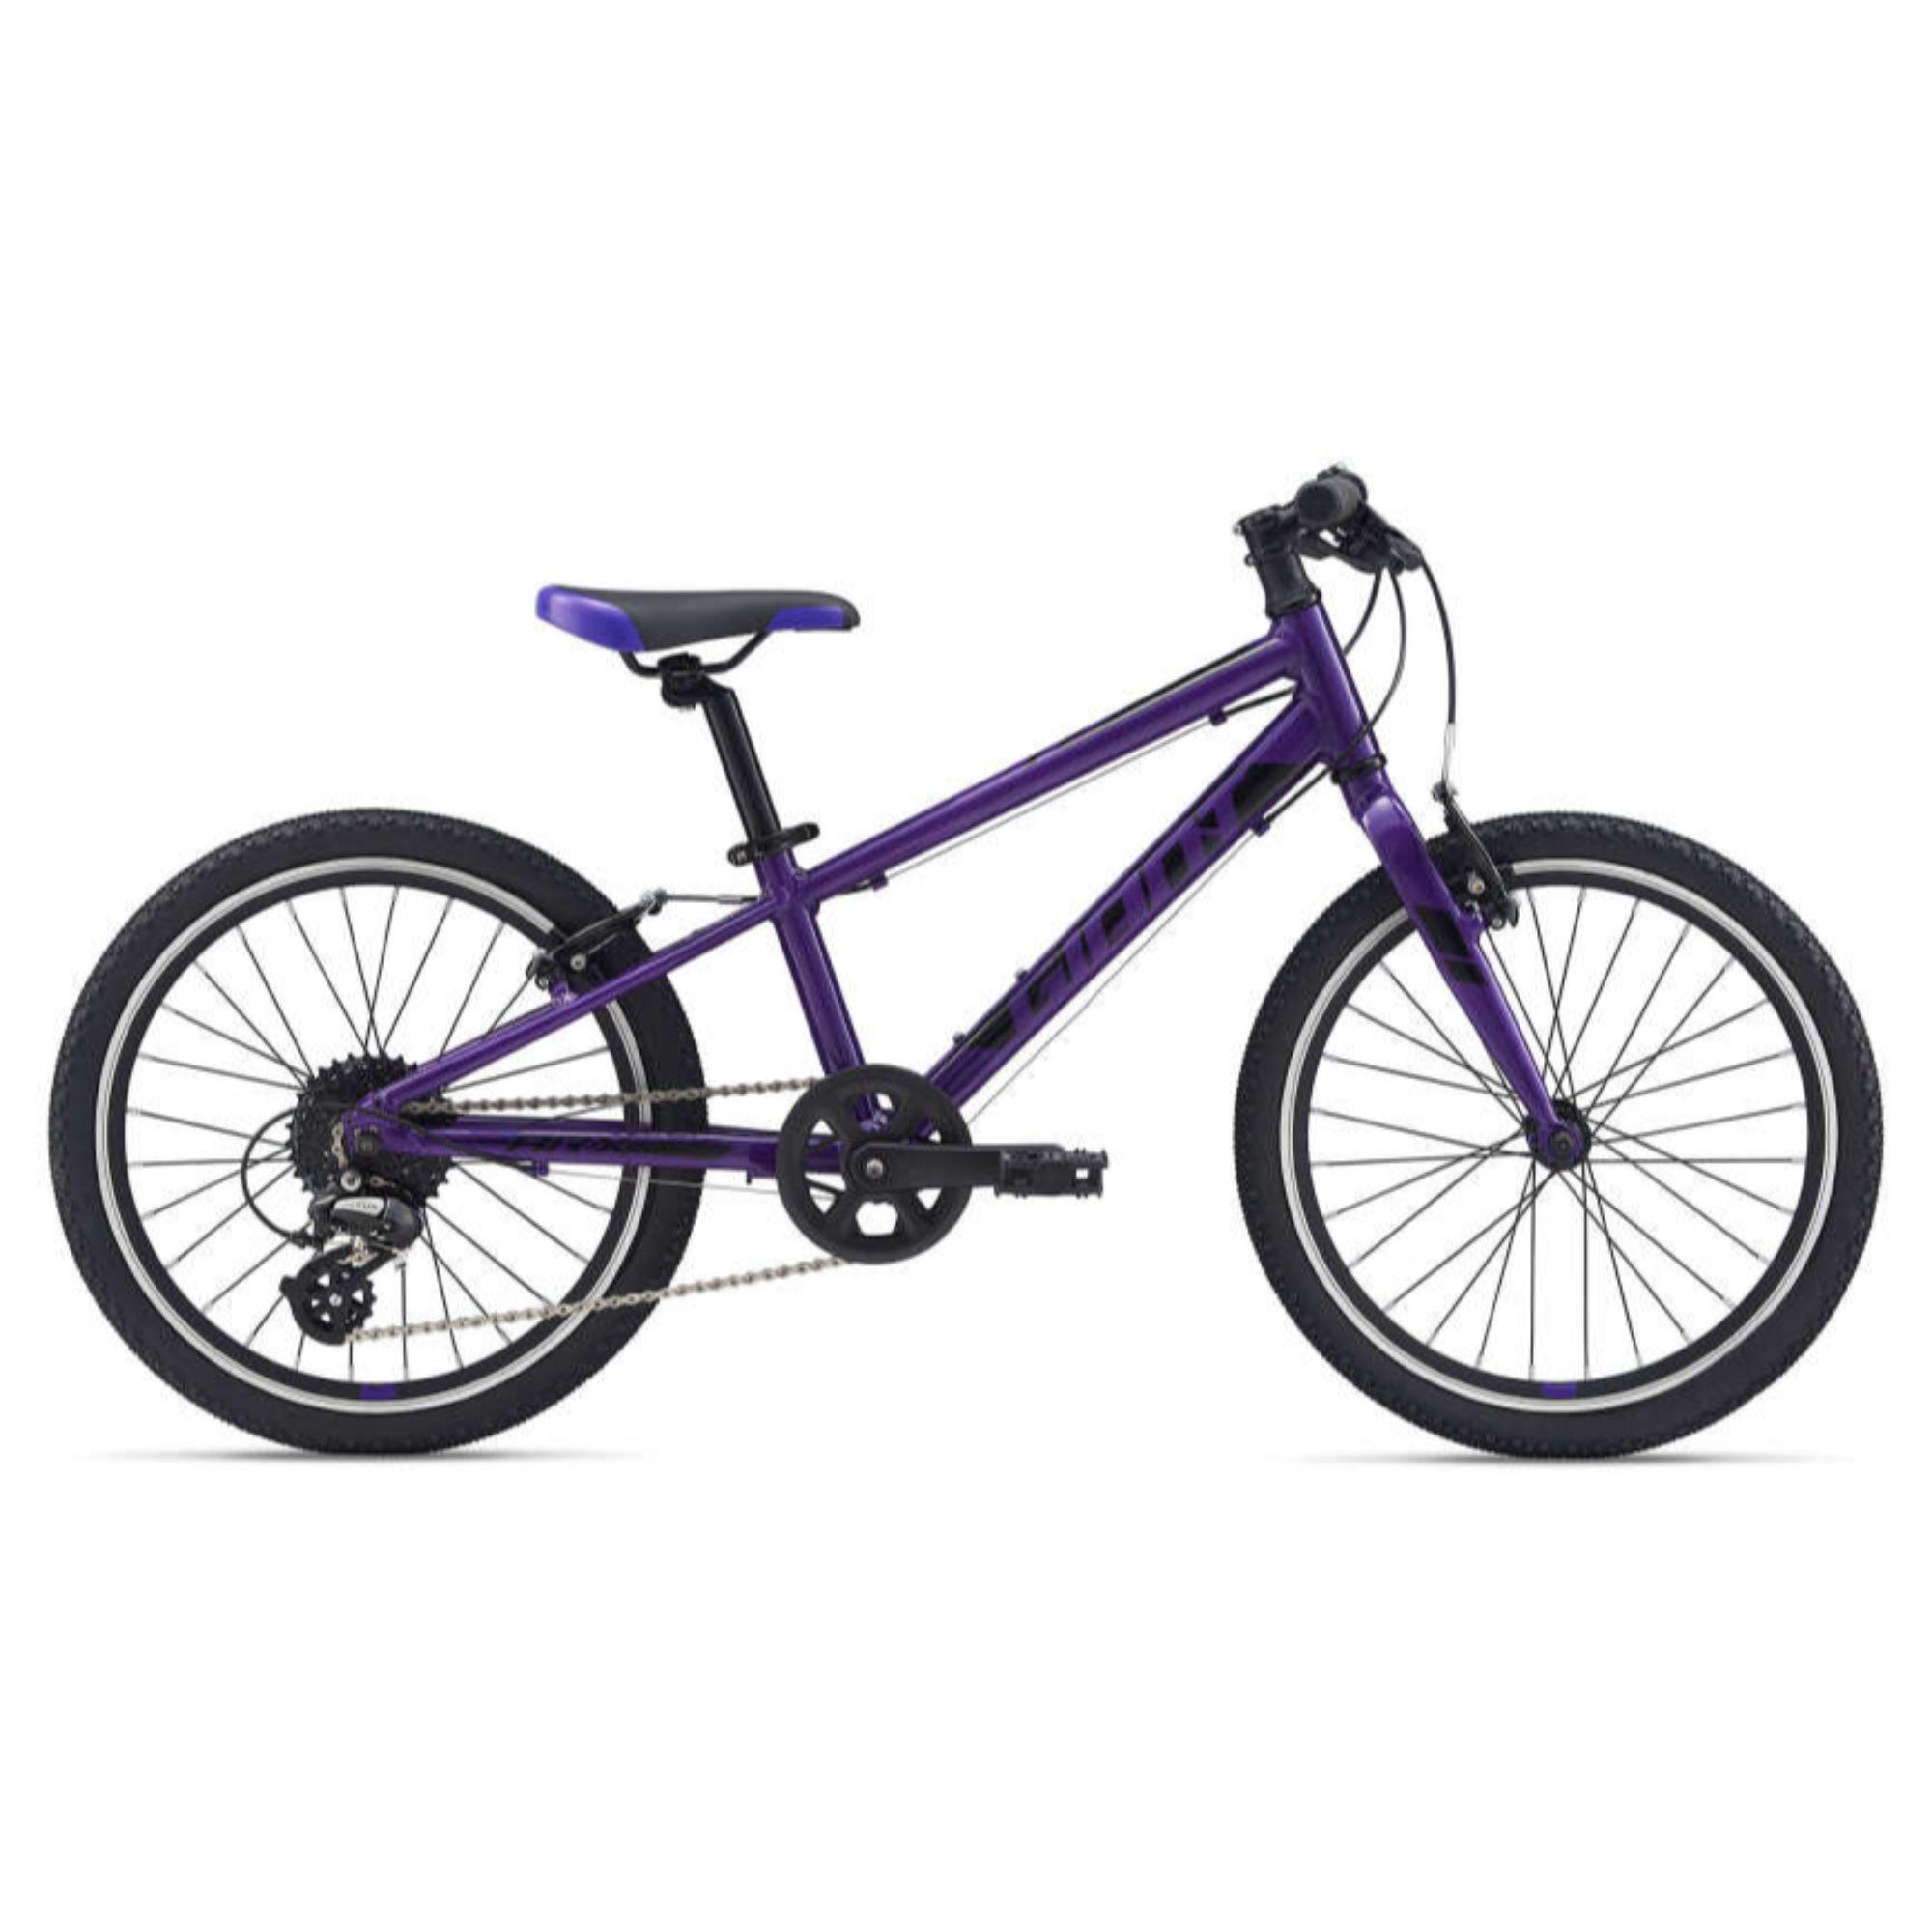 arx20_purple-1-1.jpg